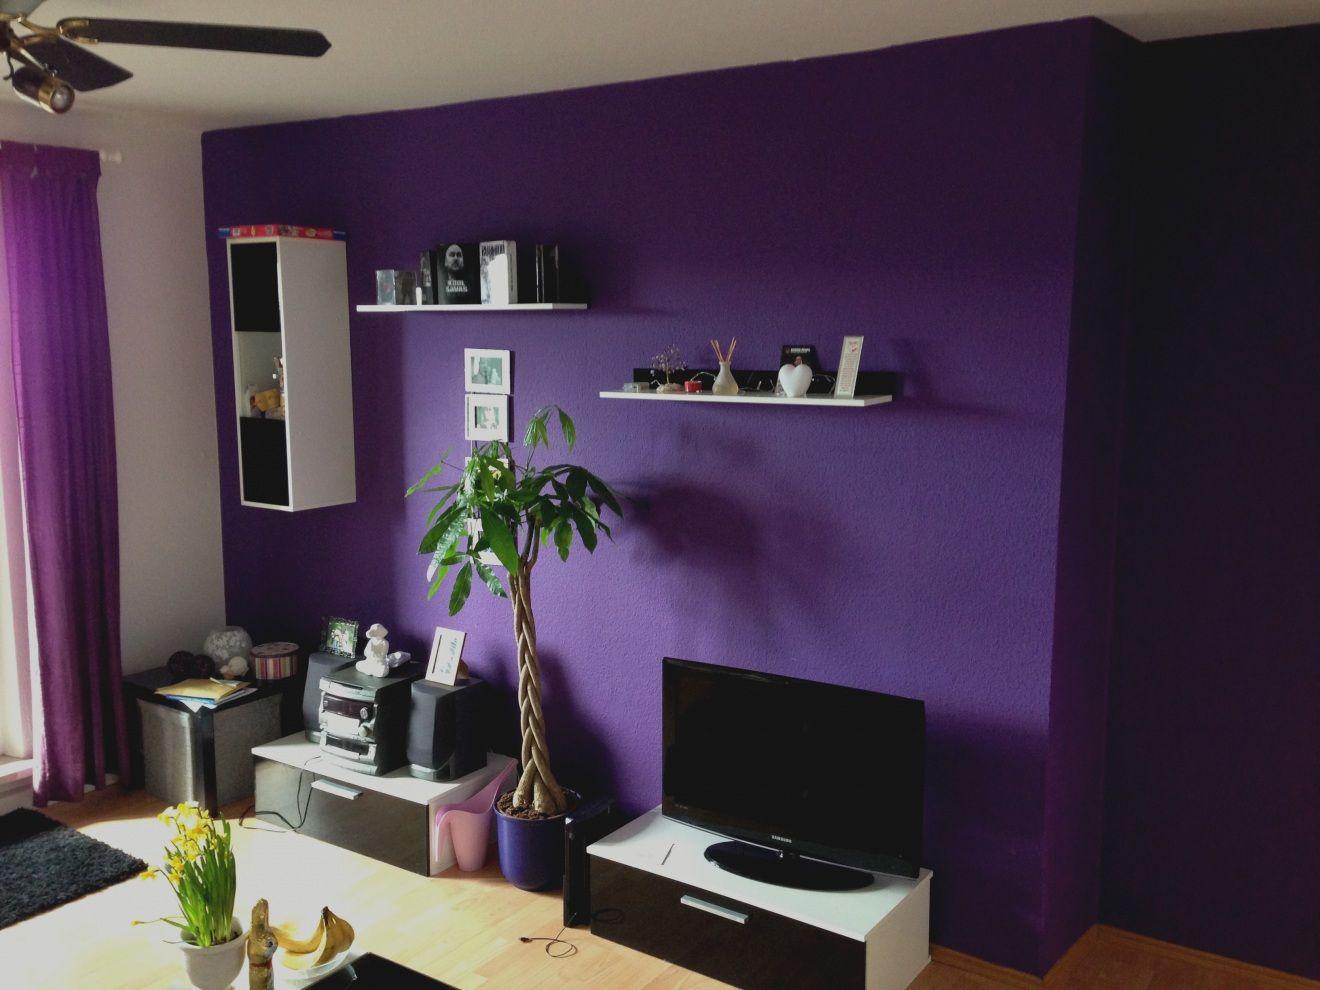 Wohnzimmer Farbe Grau Lila